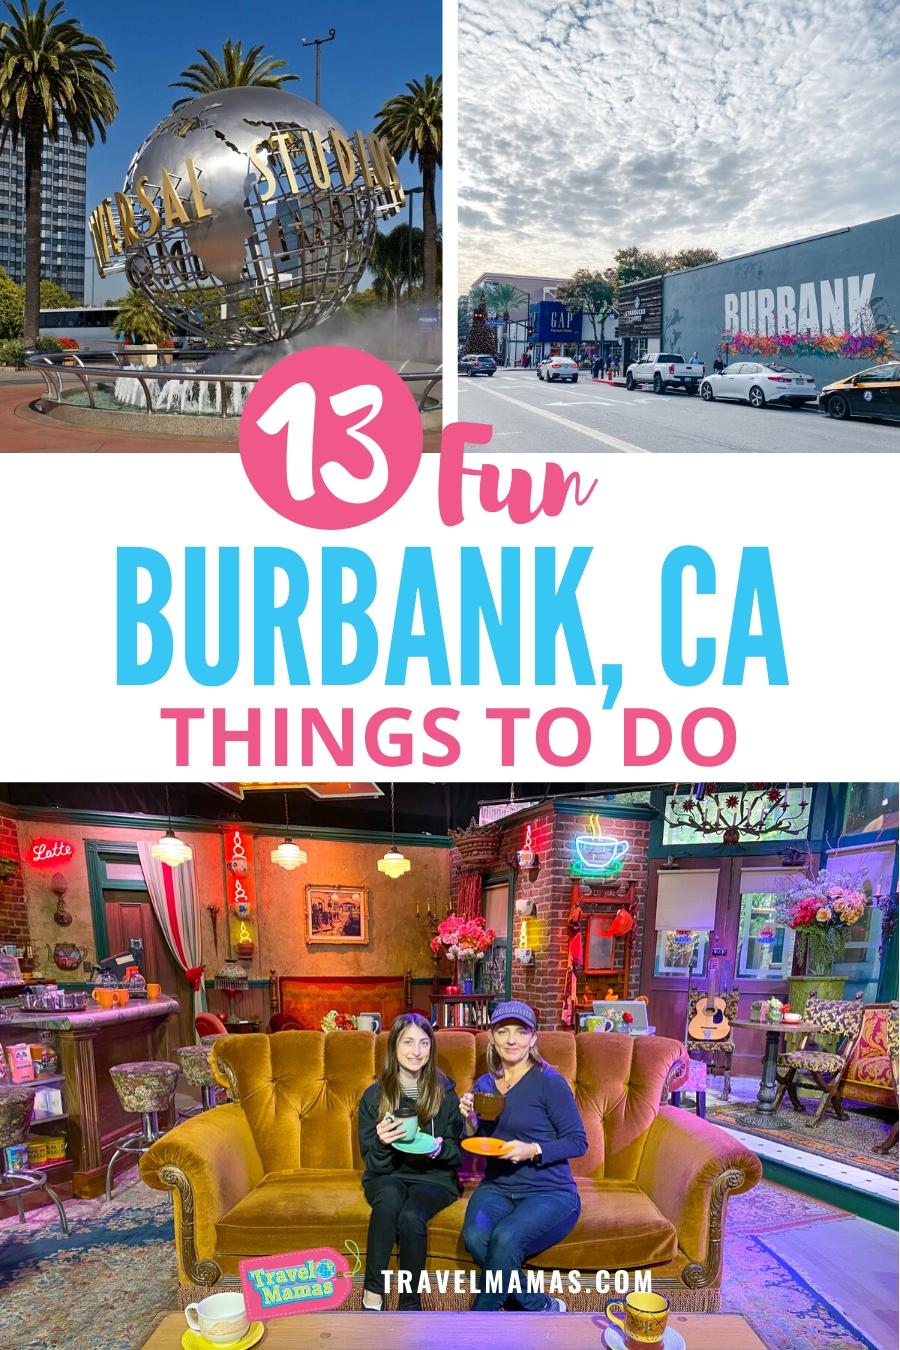 Fun Things to Do in Burbank, CA